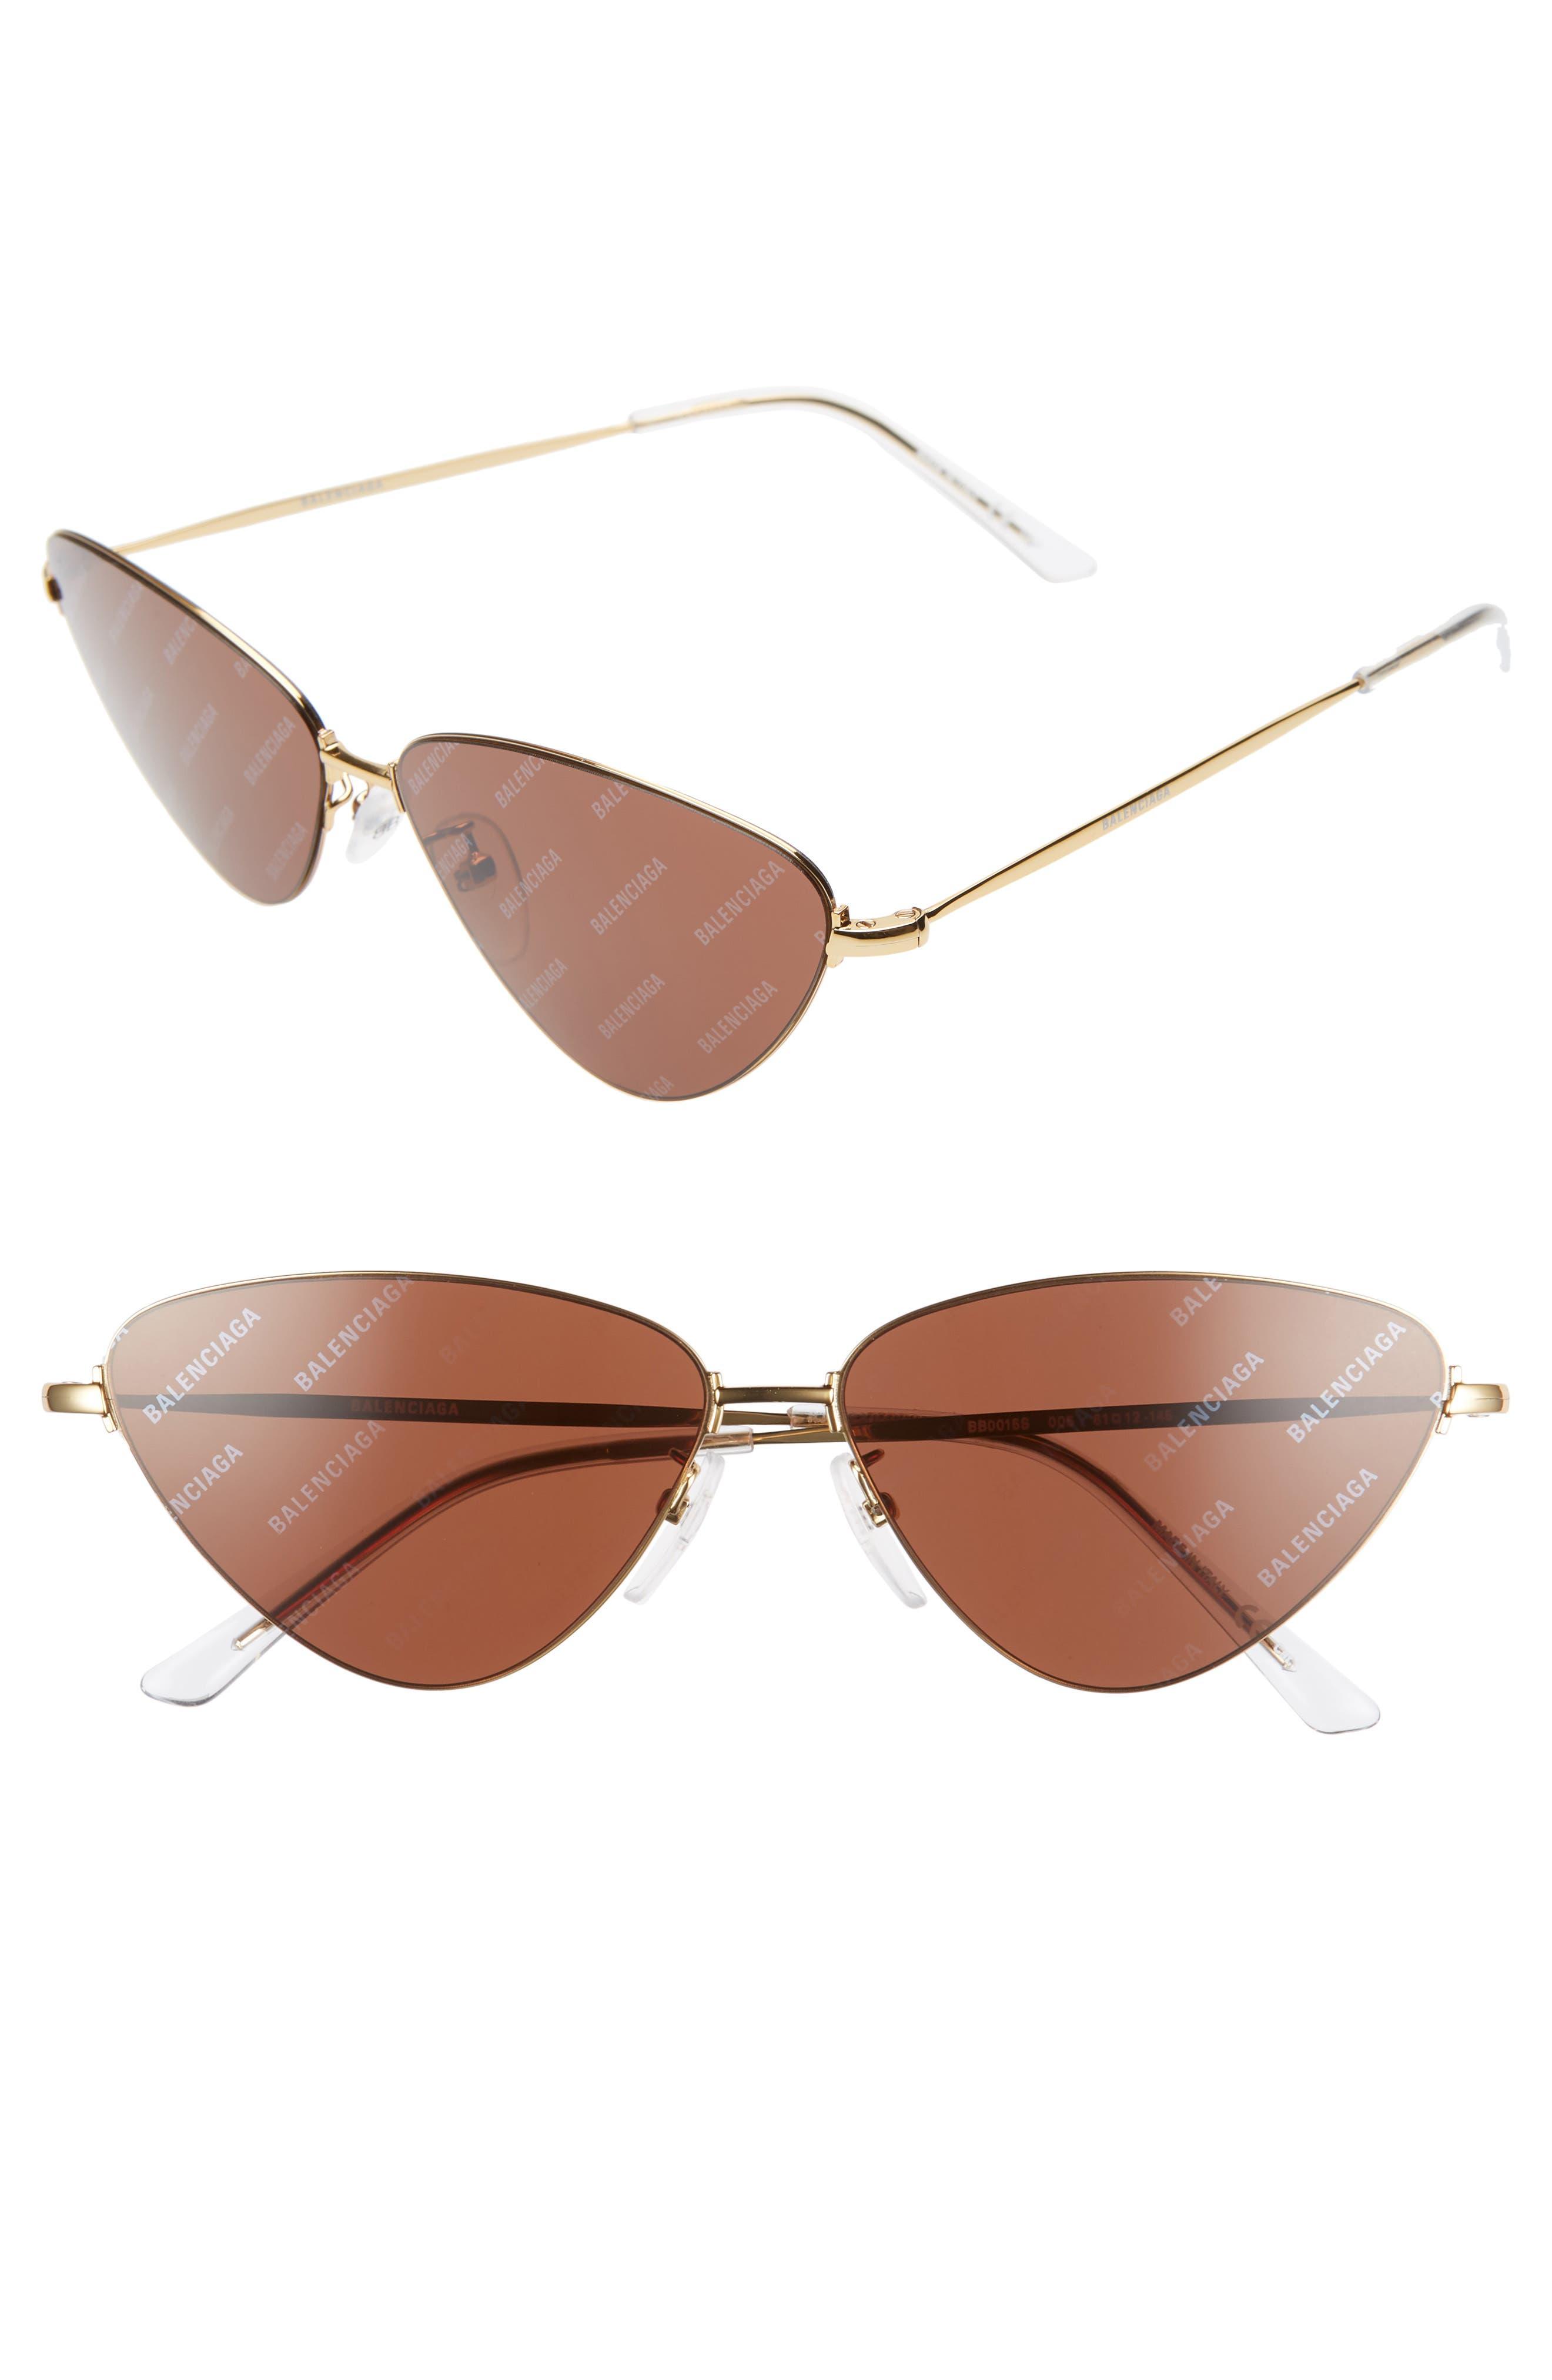 733c437bf9c Balenciaga 61Mm Cat Eye Sunglasses - Shiny Endura Gold  Brown